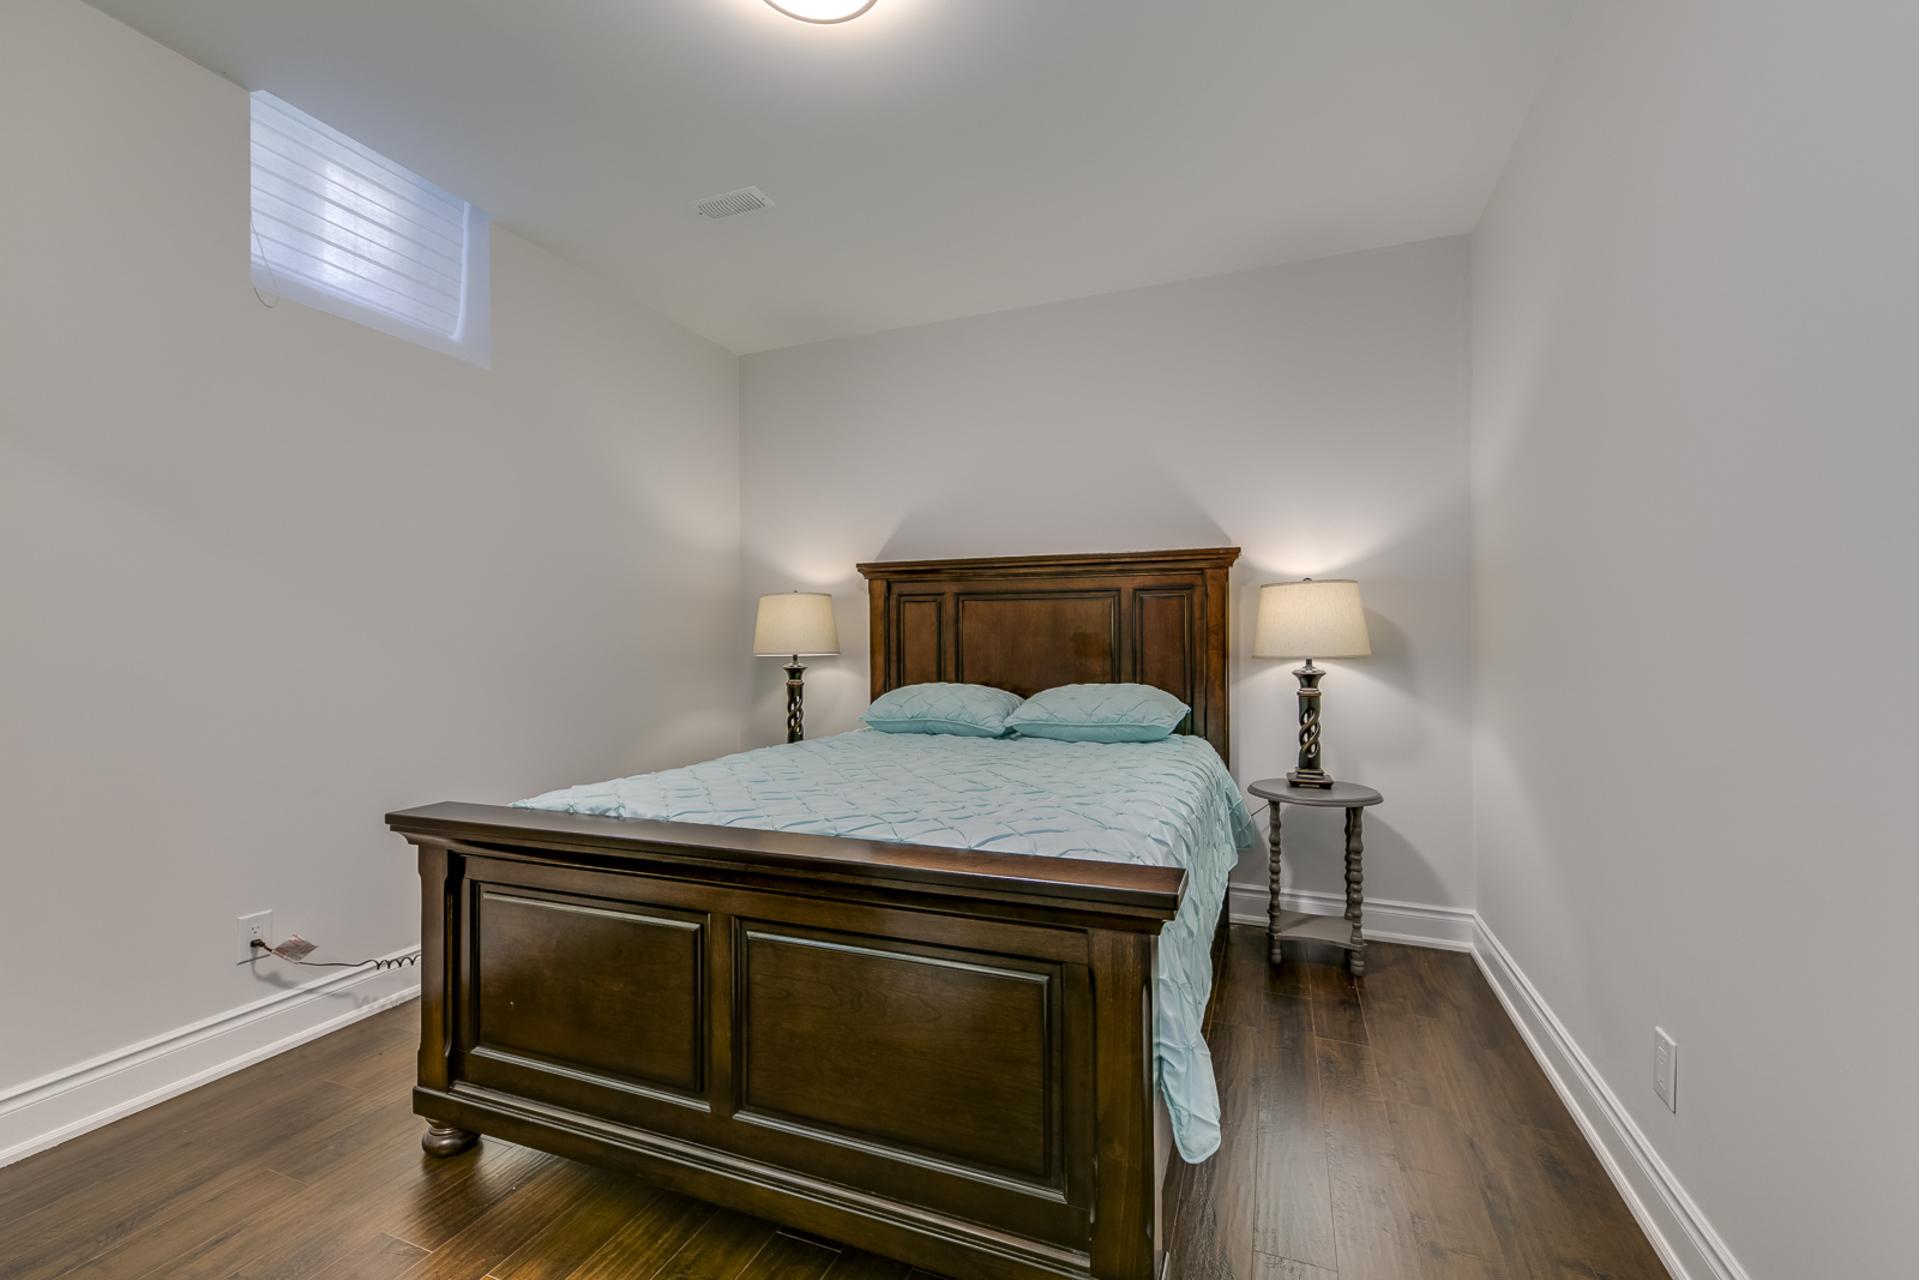 Guest Bedroom - 1276 Kestell Blvd, Oakville - Elite3 & Team at 1276 Kestell Boulevard, Iroquois Ridge North, Oakville